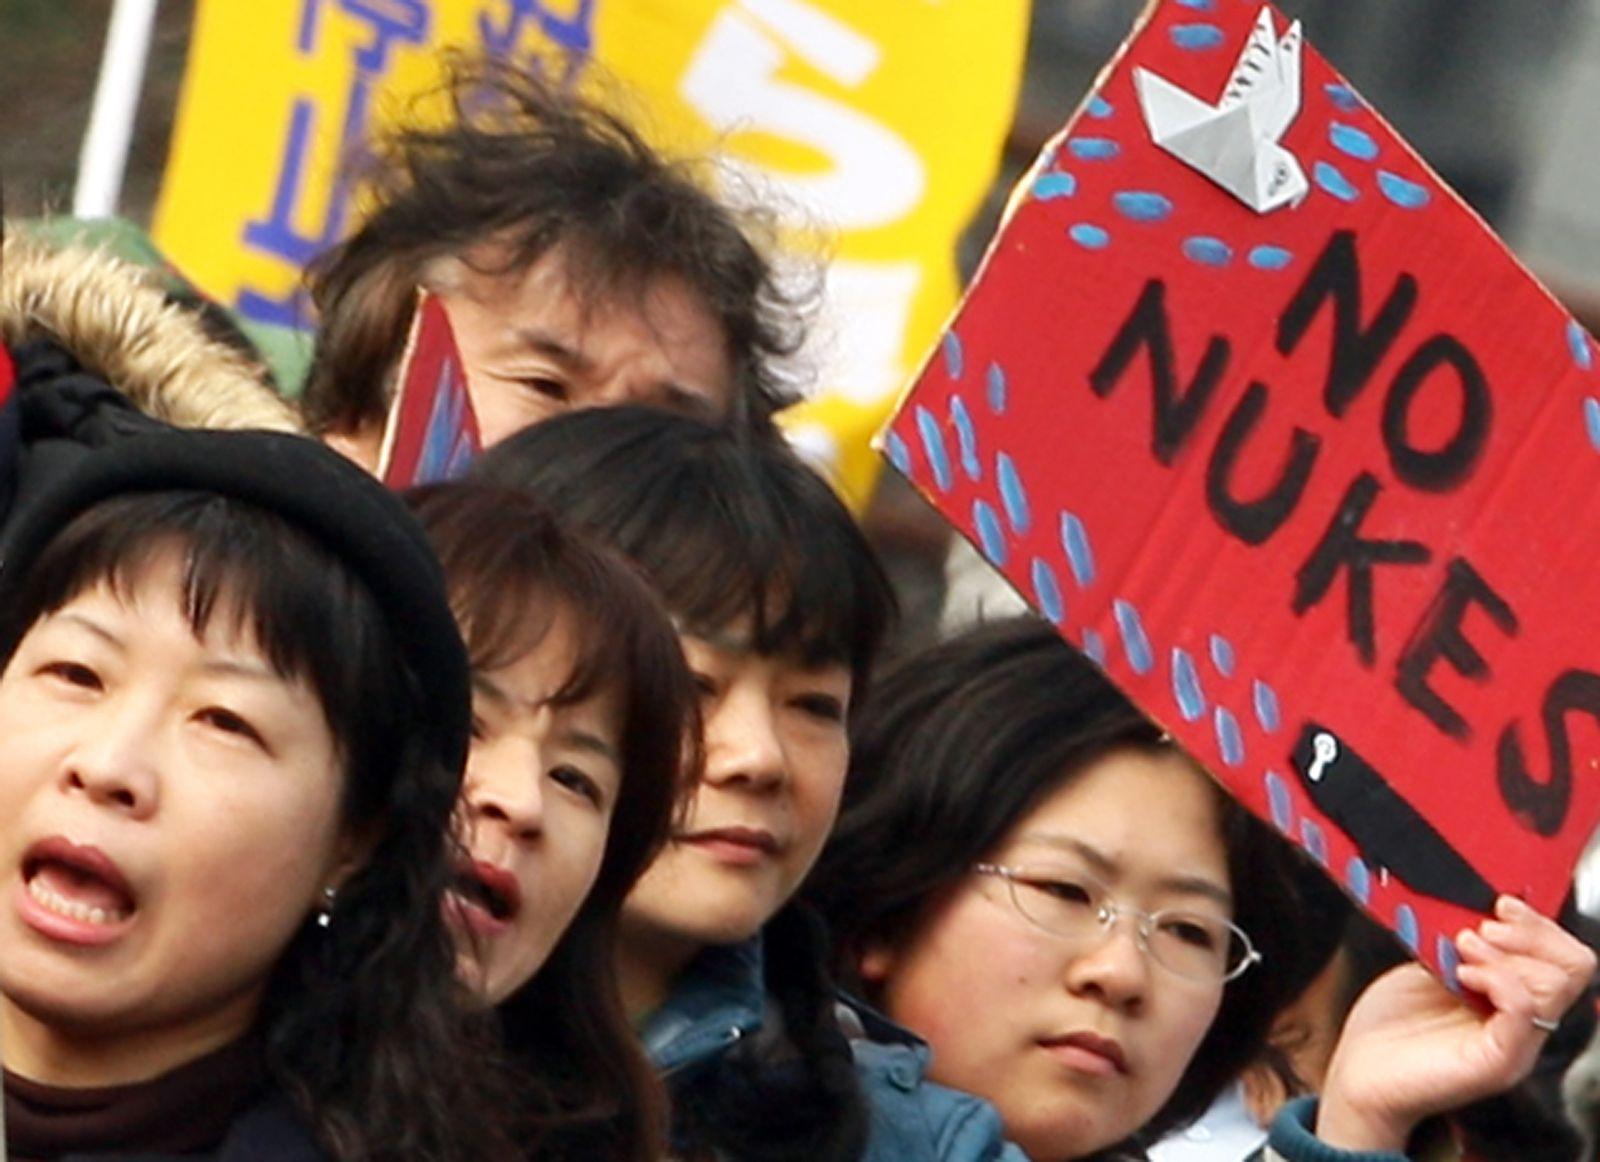 Japan / Atomkraft / Protest